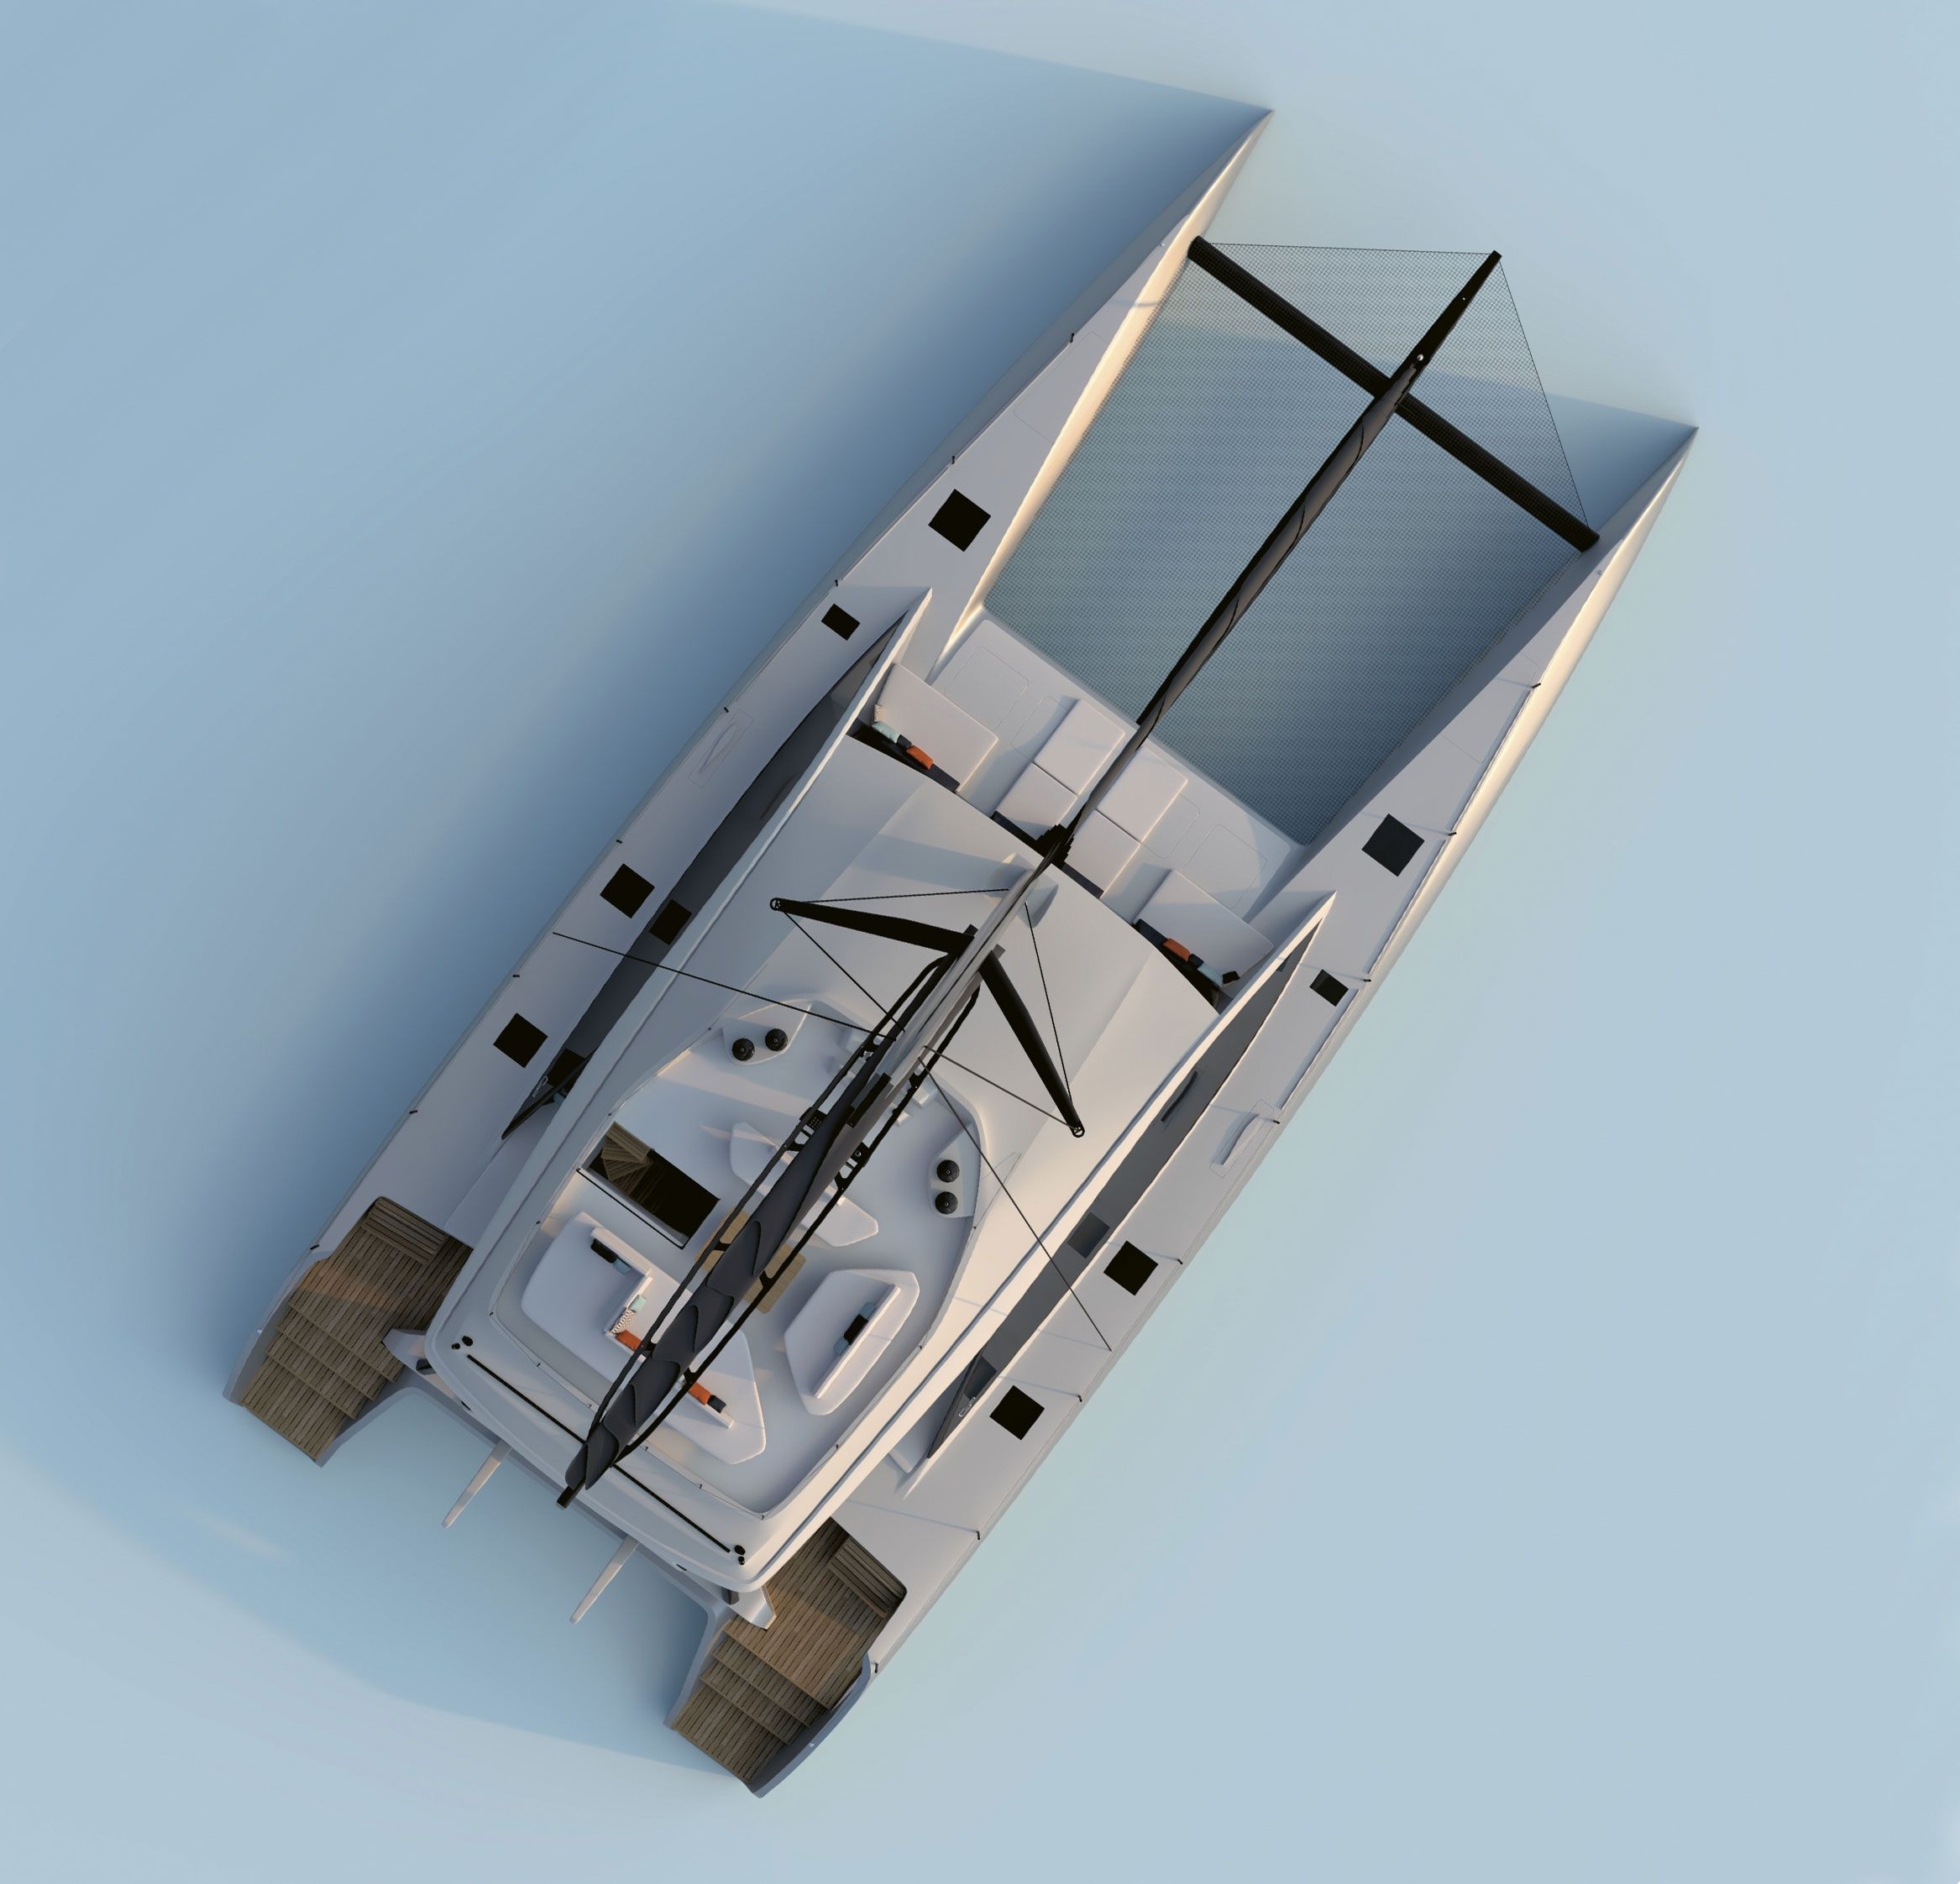 Bird's-eye view of thr new Gunboat design